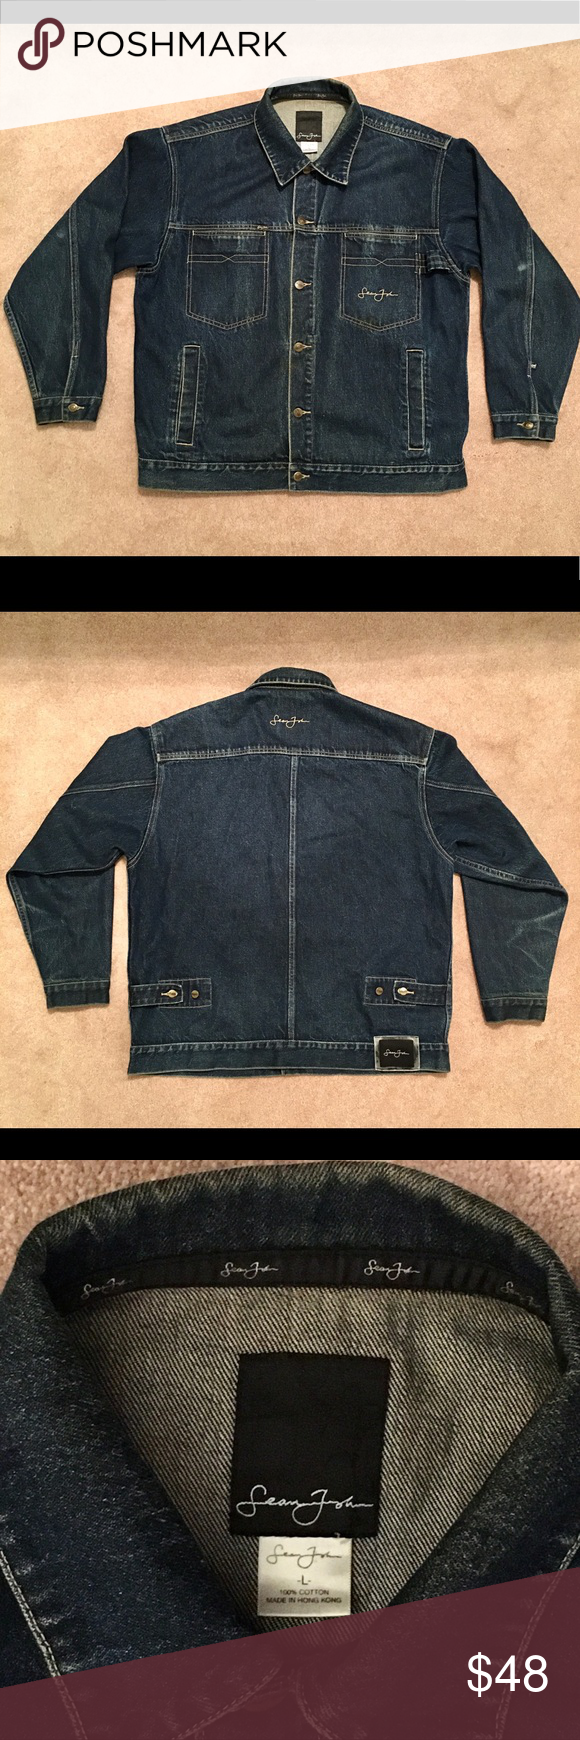 Men S Sean John Jean Jacket Sean John Jeans Jackets Jean Jacket [ 1740 x 580 Pixel ]